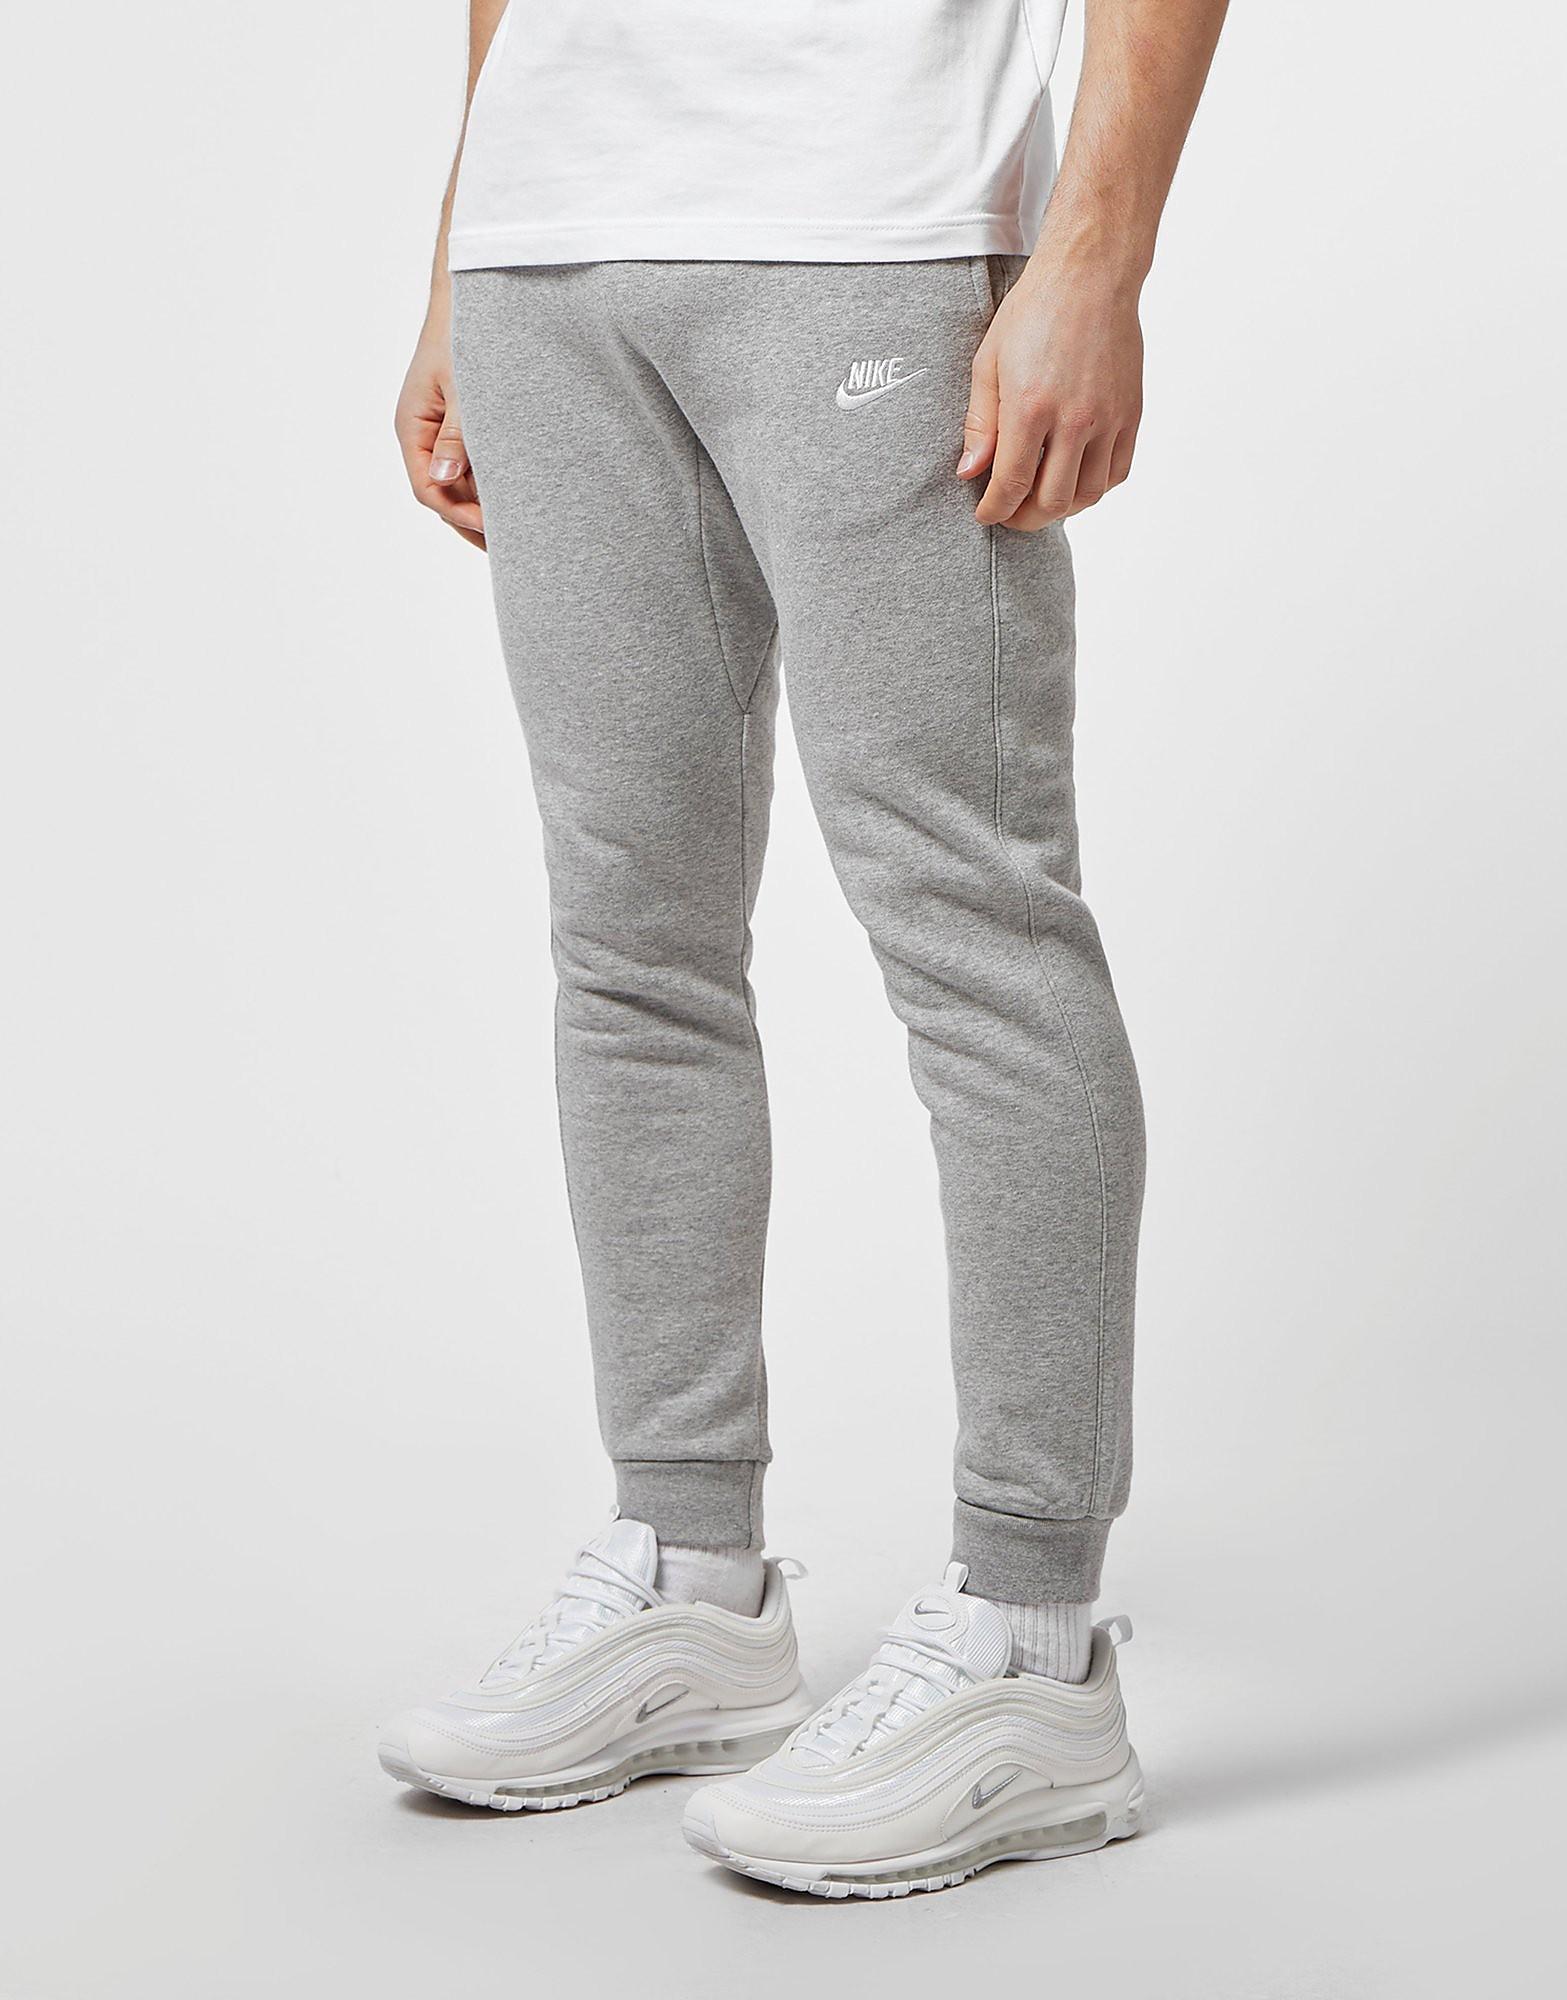 Nike Foundation Cuffed Fleece Joggers